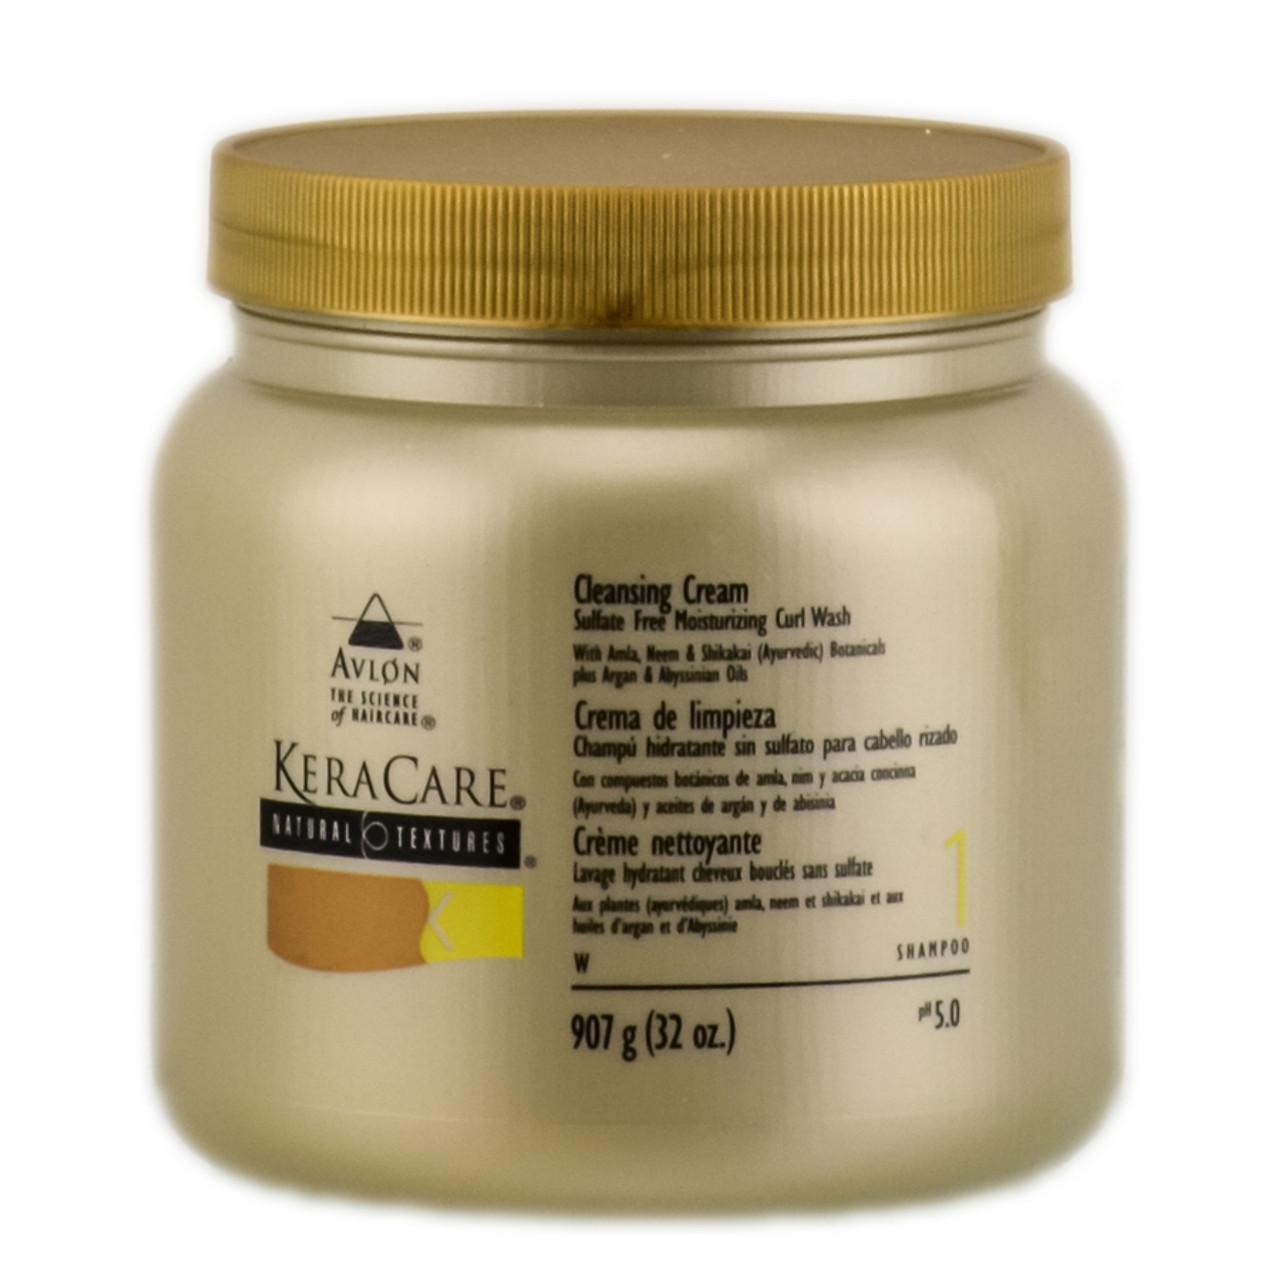 Avlon Keracare Natural Textures Cleansing Cream - SleekShop.com